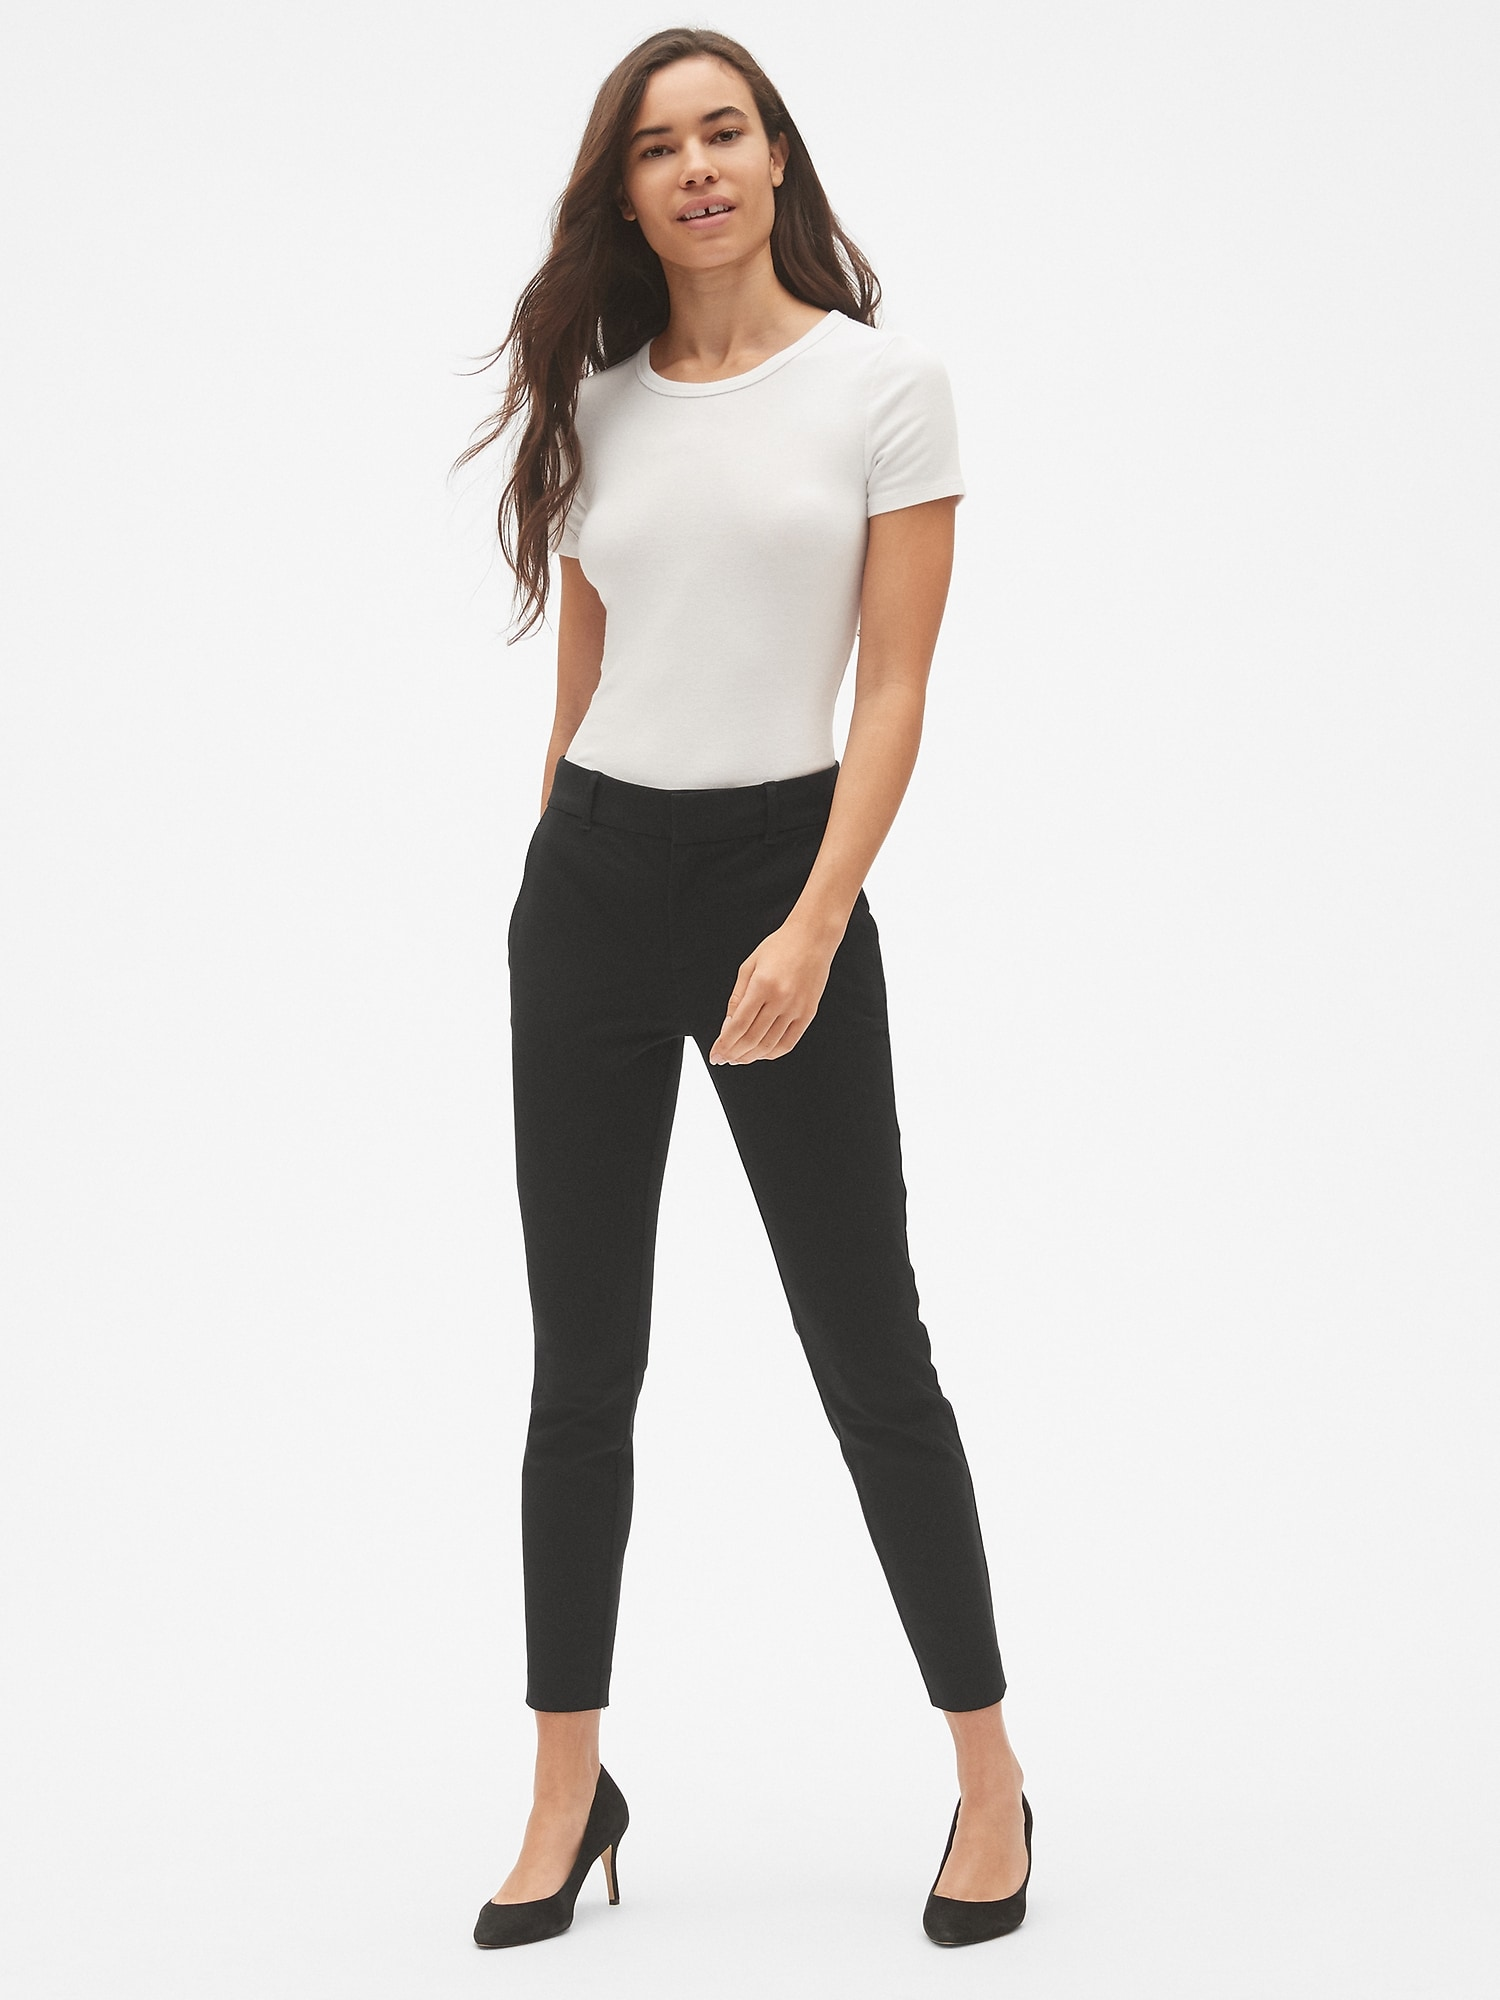 Gap Black Signature Skinny Ankle Pants with Secret Smoothing Pockets 14